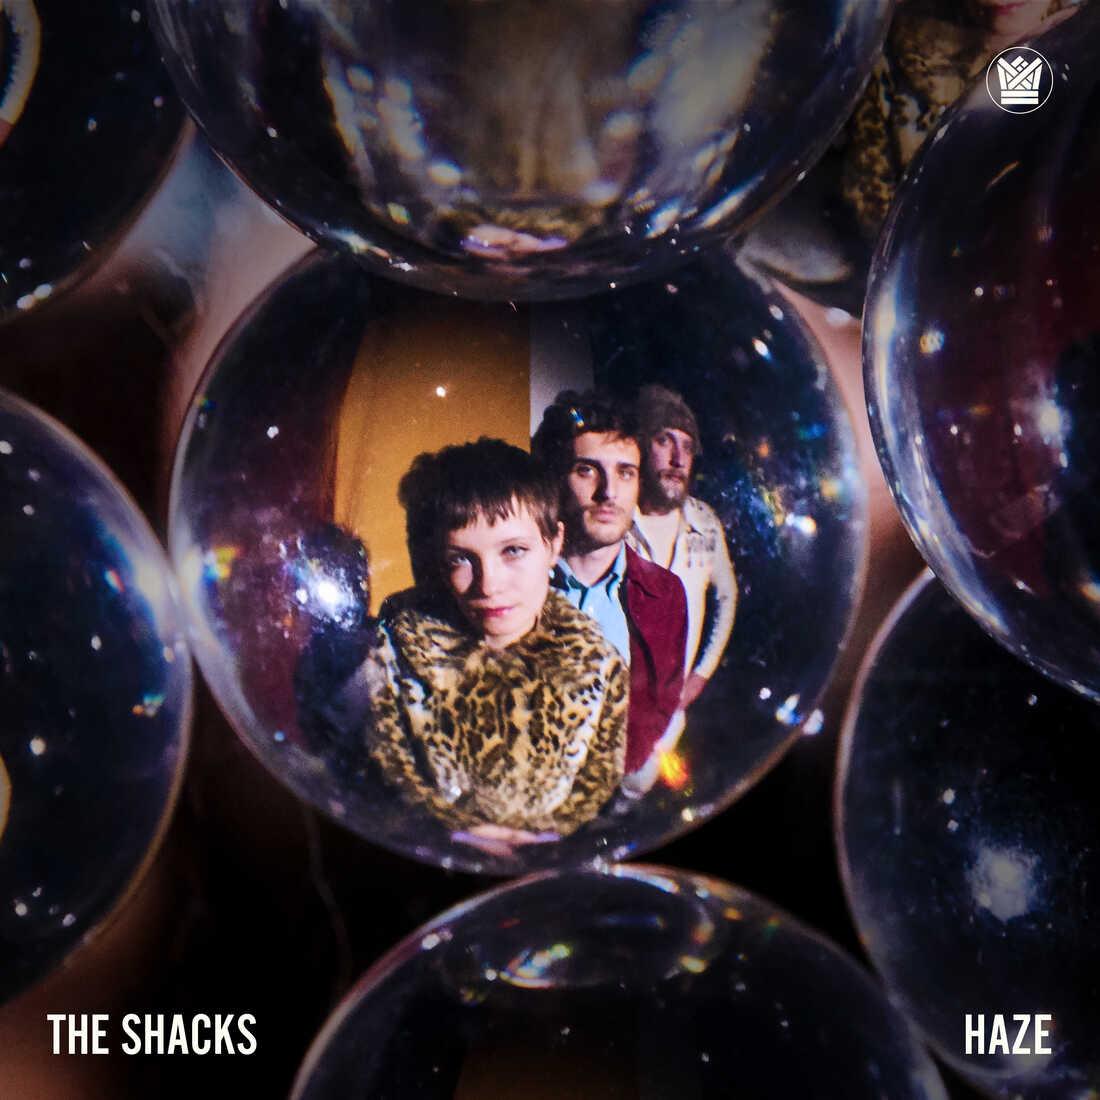 The Shacks, Haze